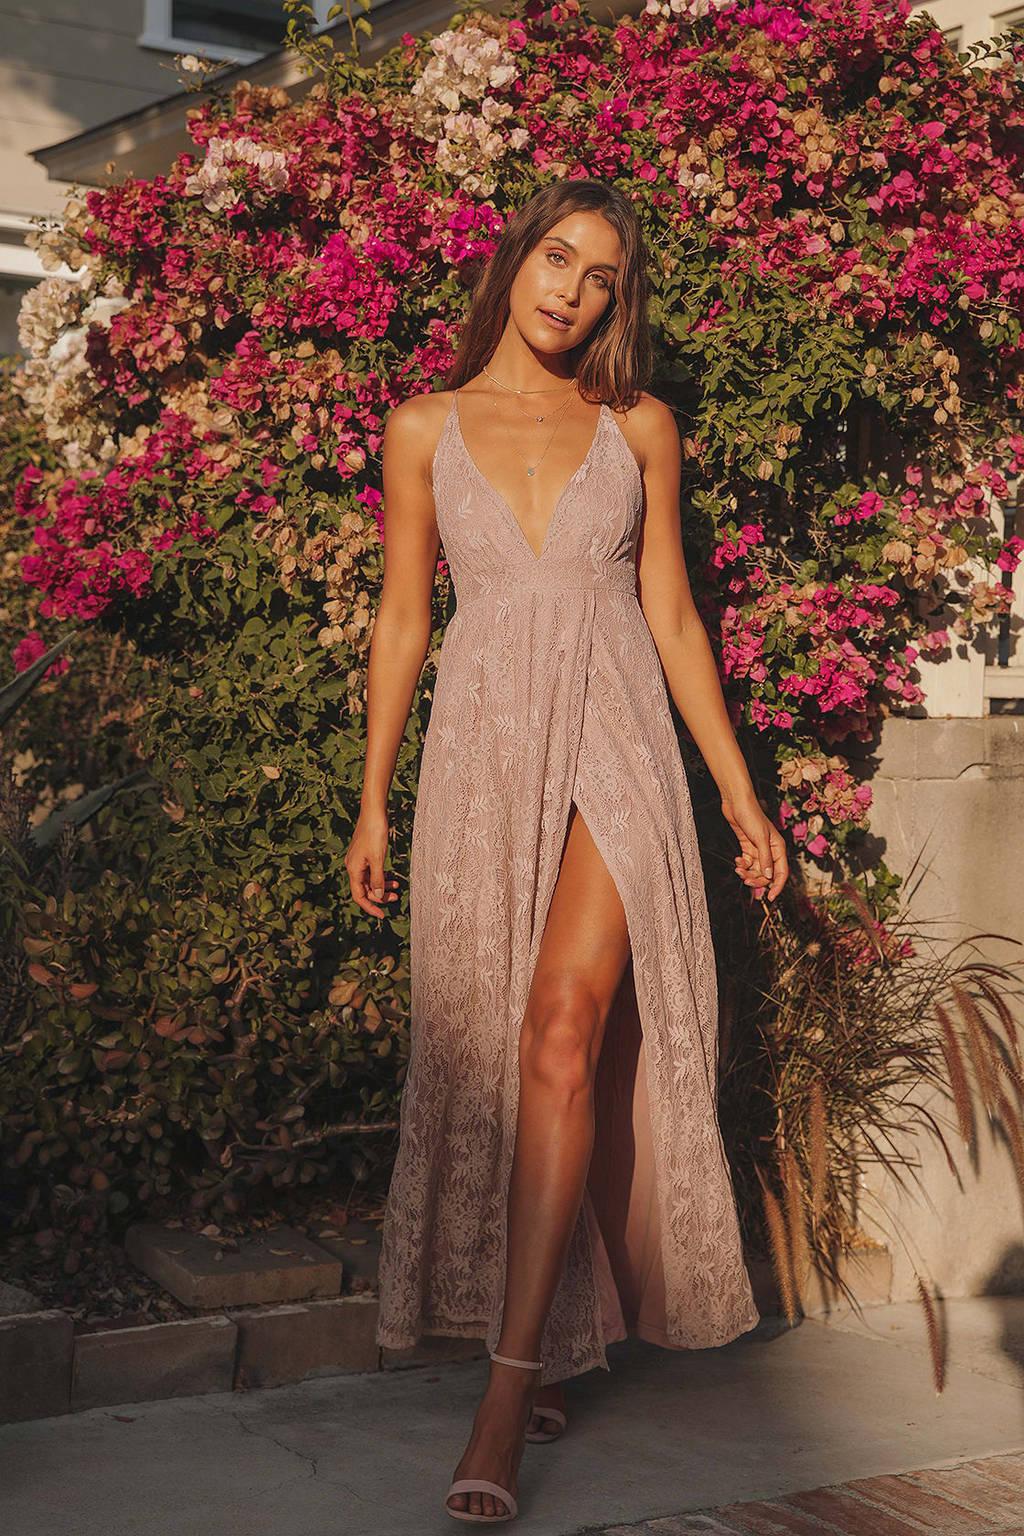 Dusty pink maxi dress from Lulu's